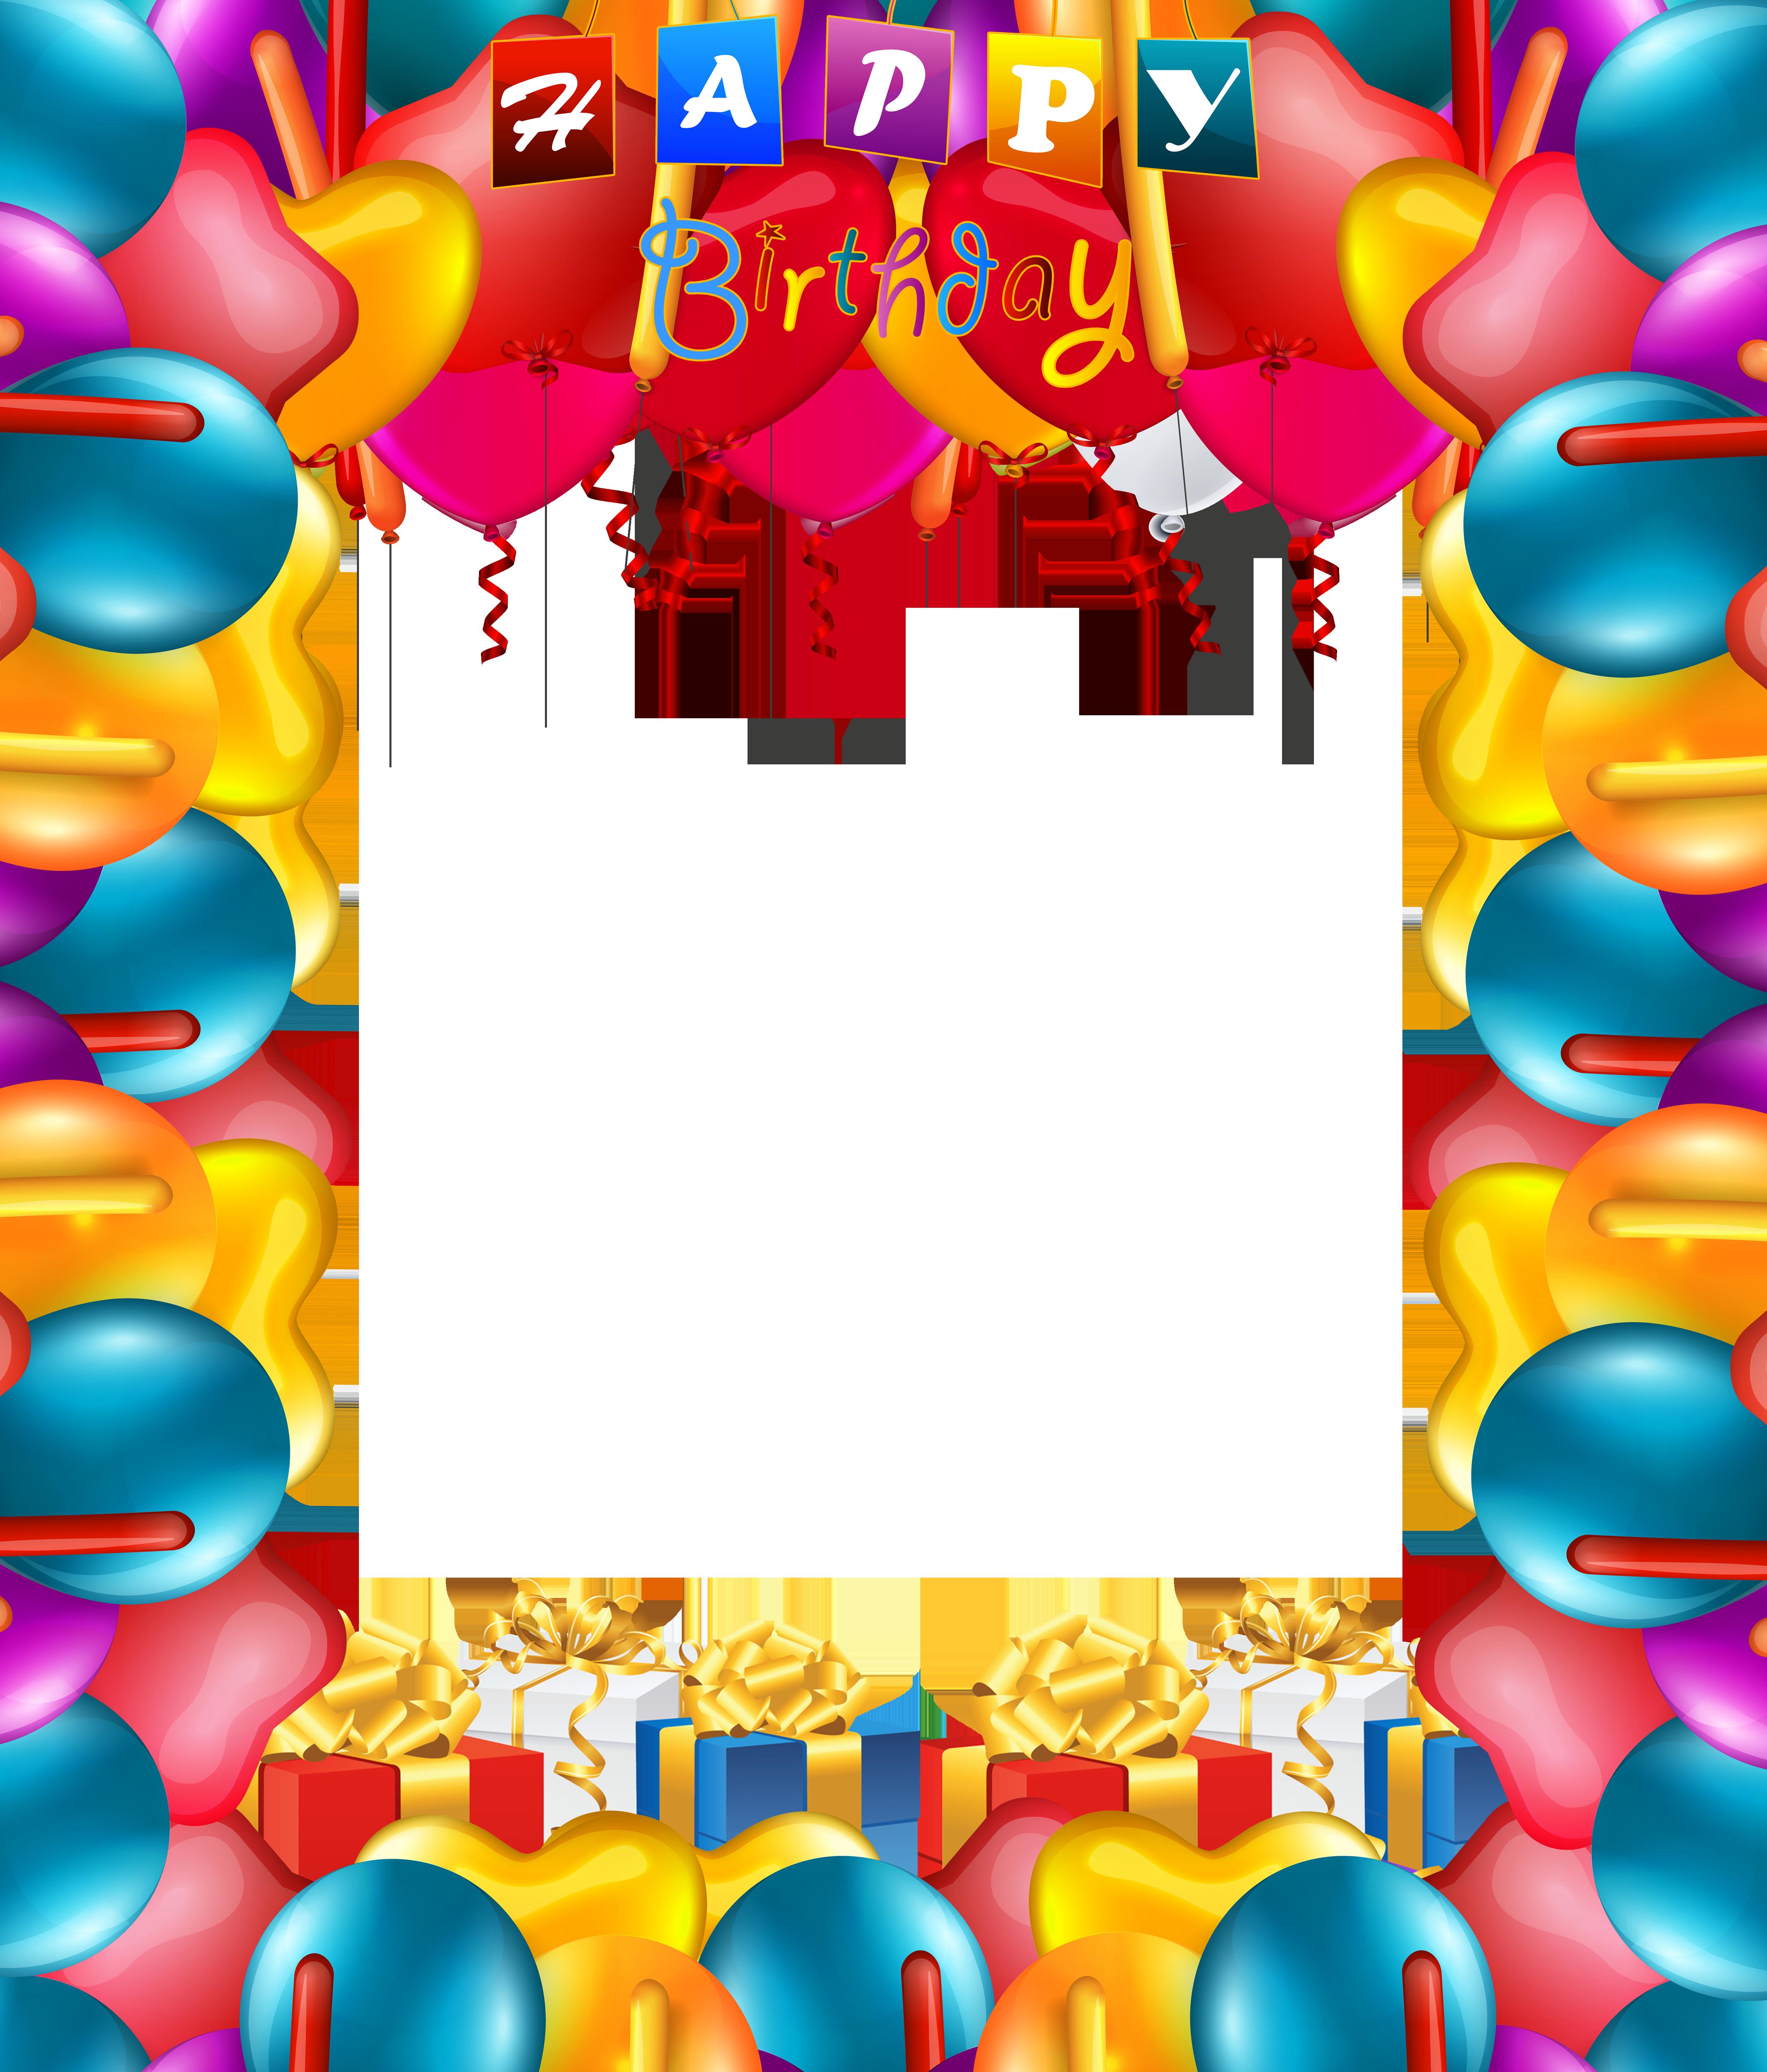 Happy birthday balloons transparent. Balloon clipart frame